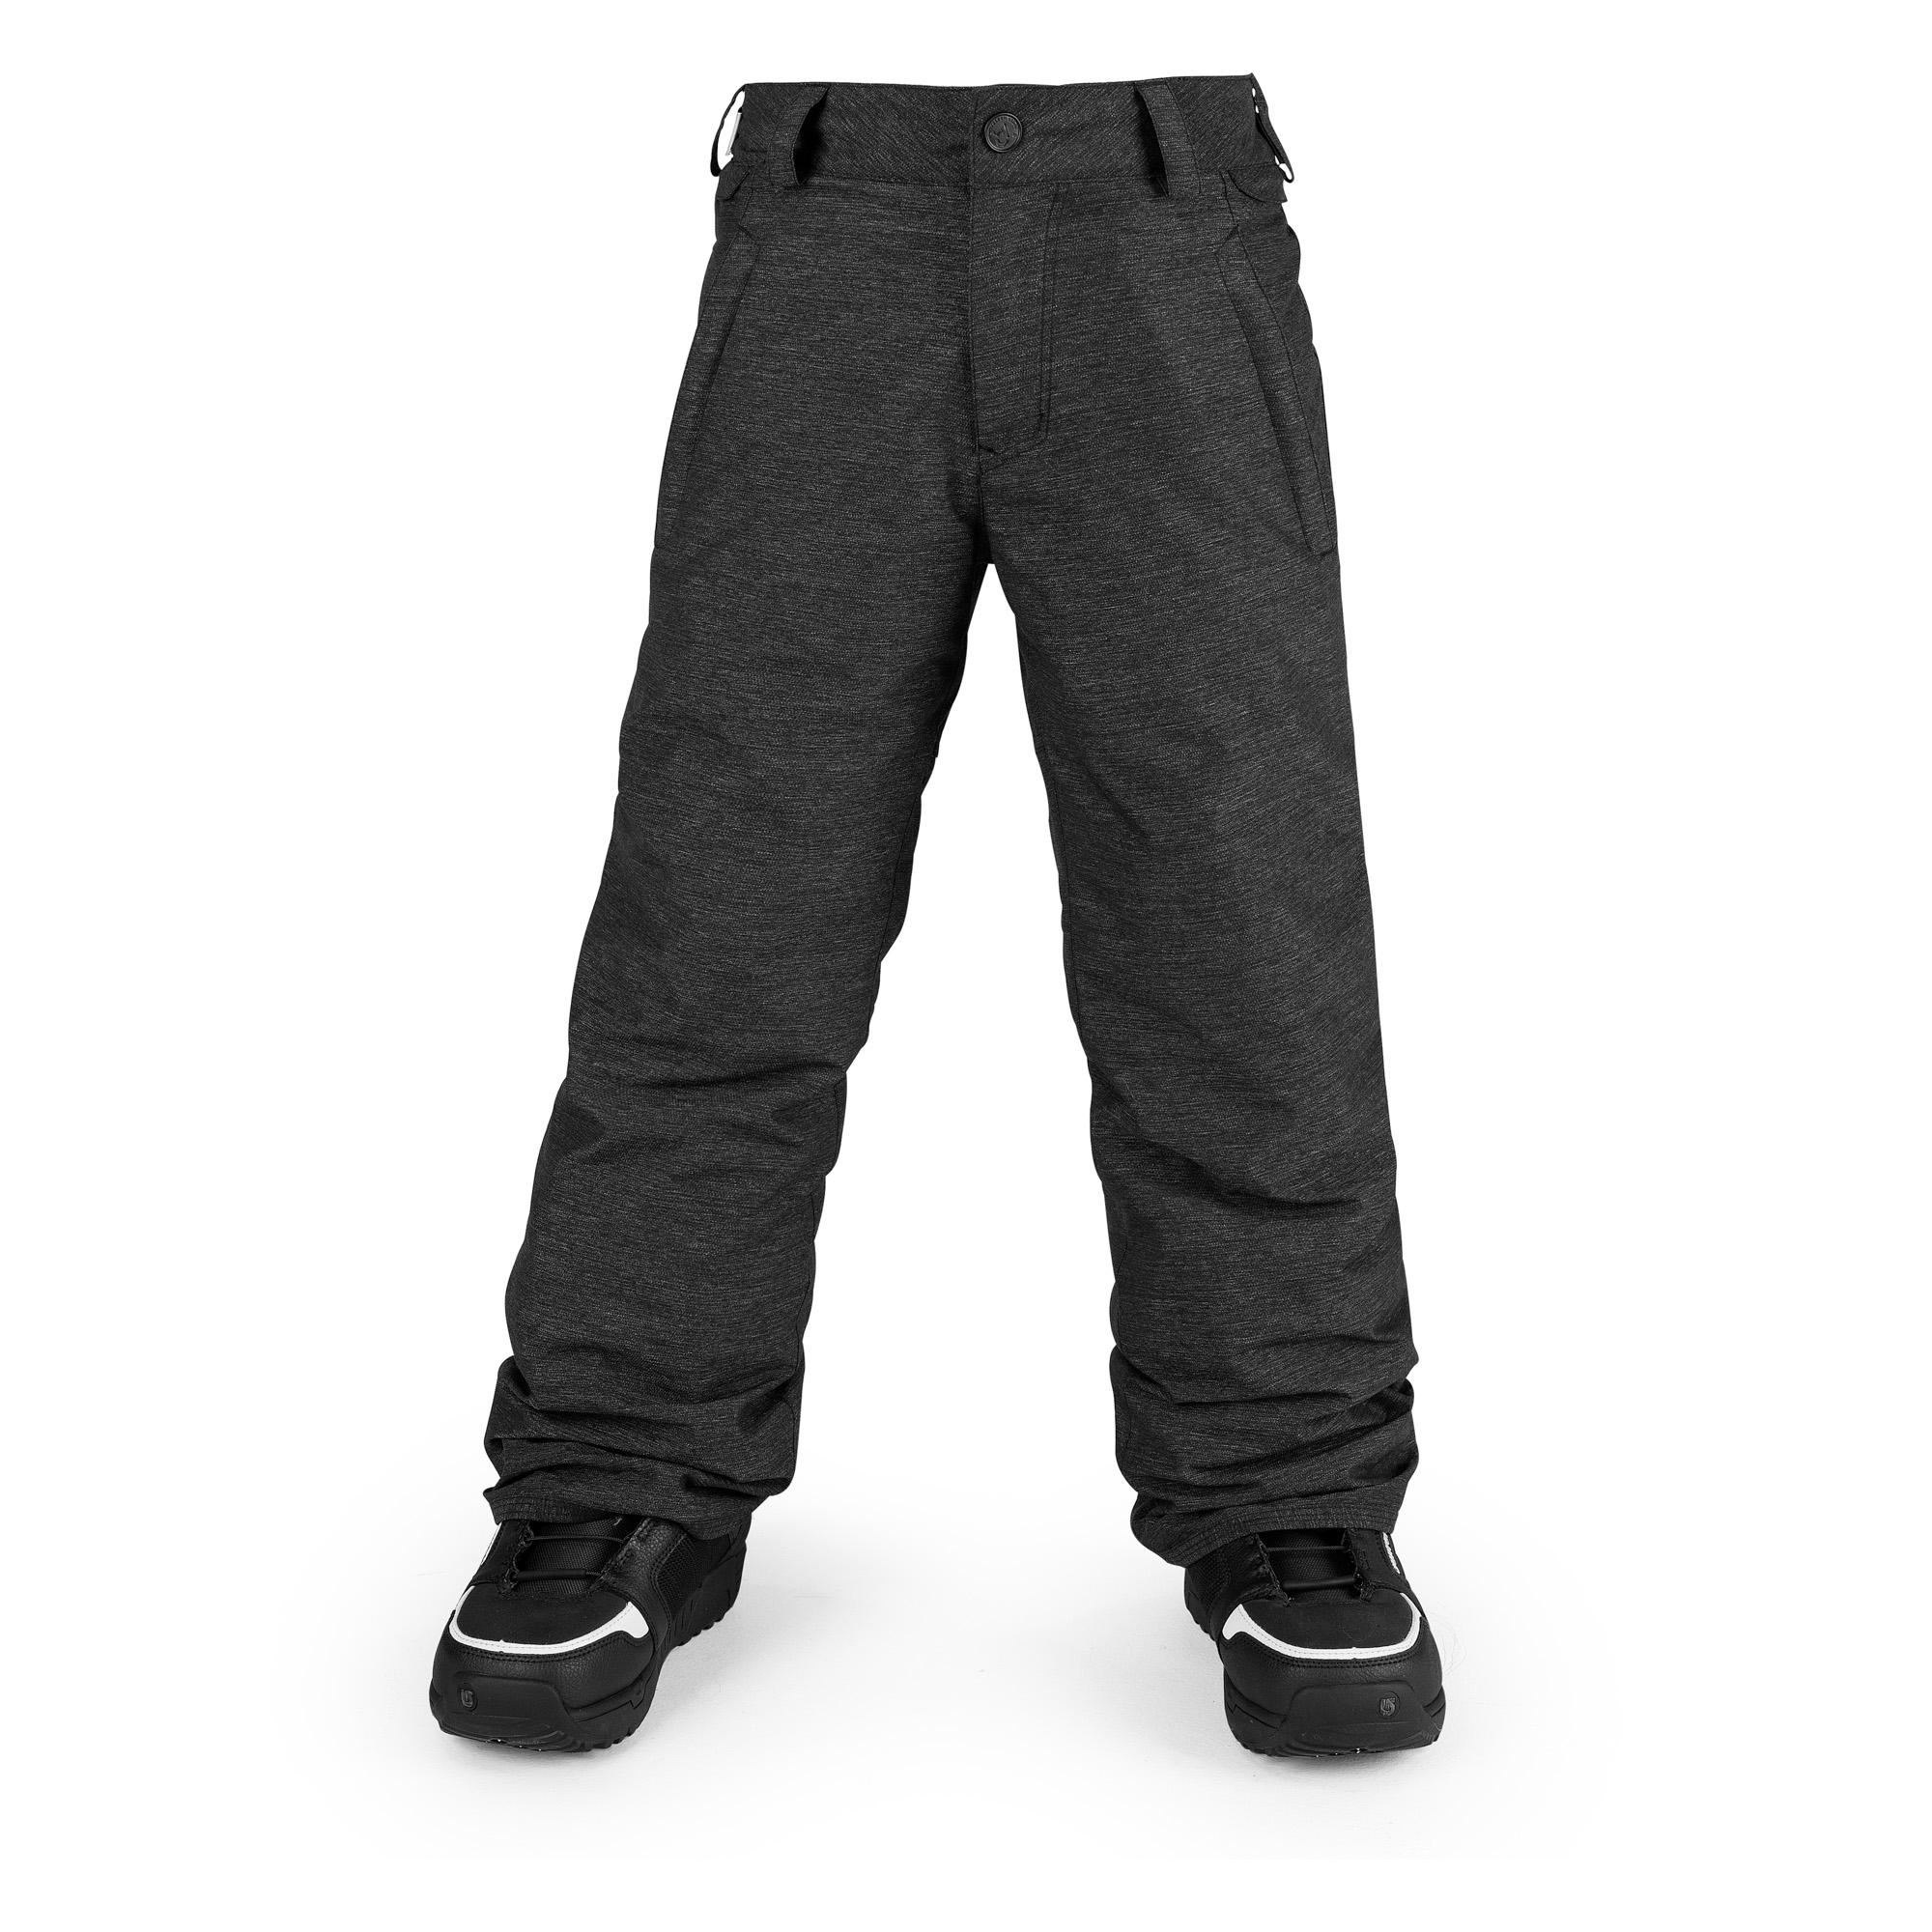 Volcom Explorer Insulated Snowboard Pant 2018